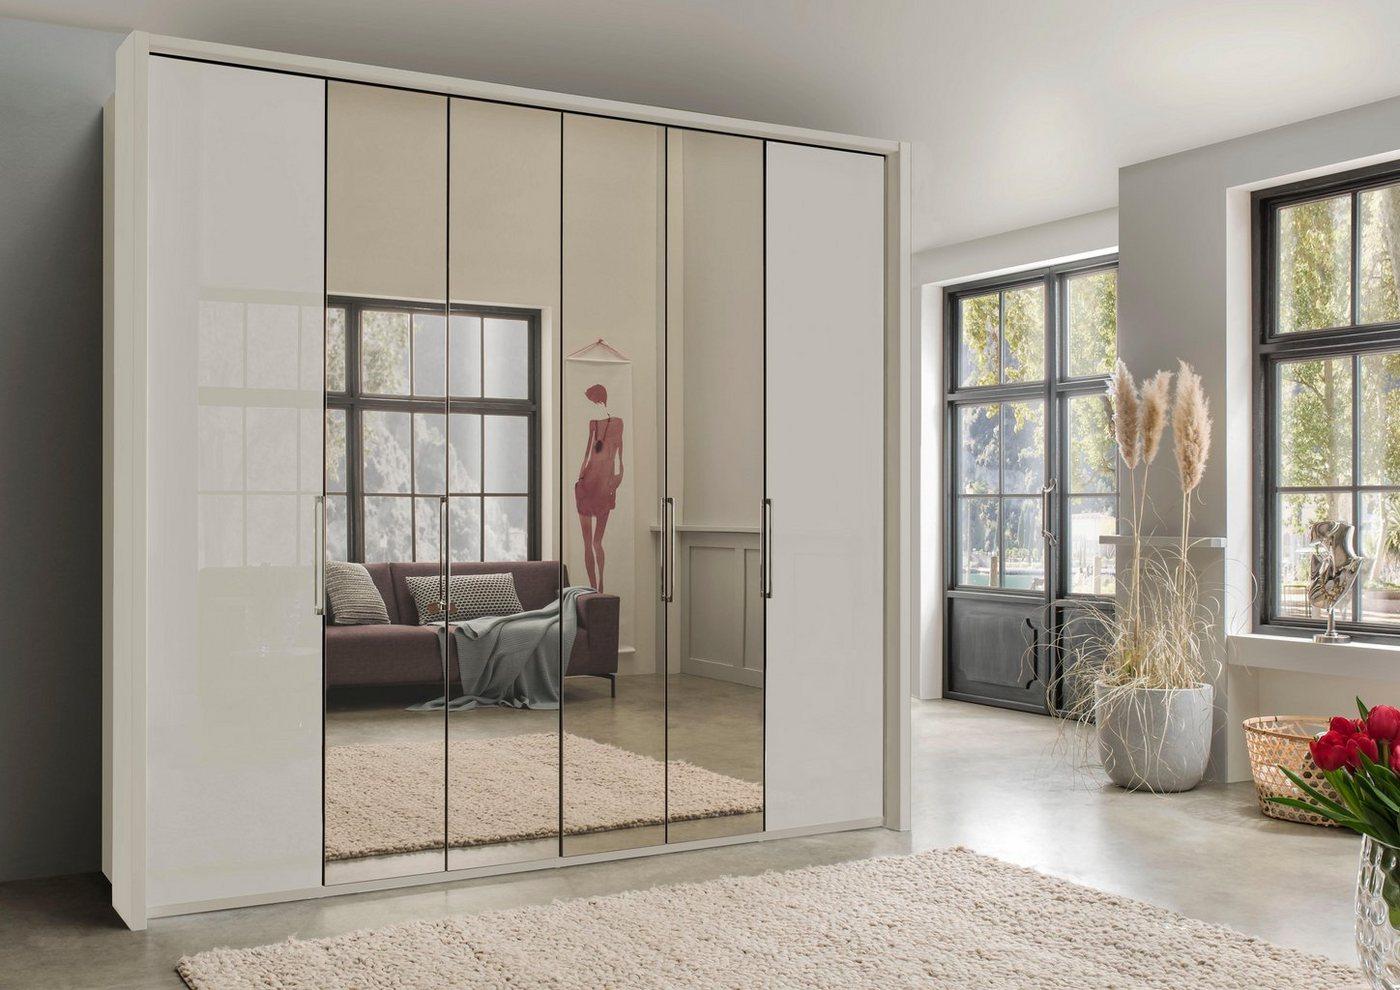 WIEMANN garderobekast, met spiegel en glas